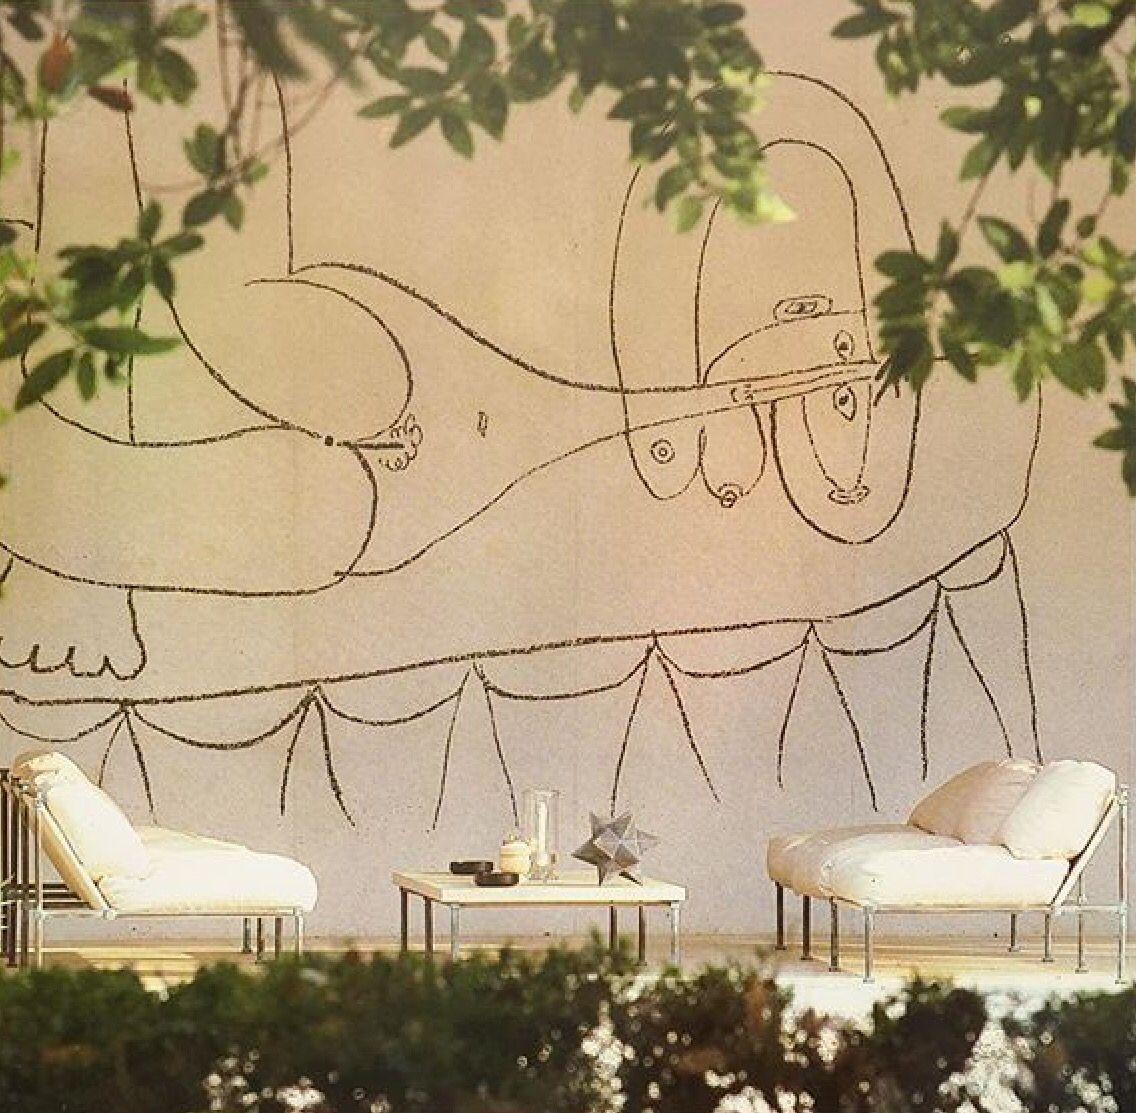 Picasso - France, 1962 | exteriors | Pinterest | Picasso, Fresco and ...